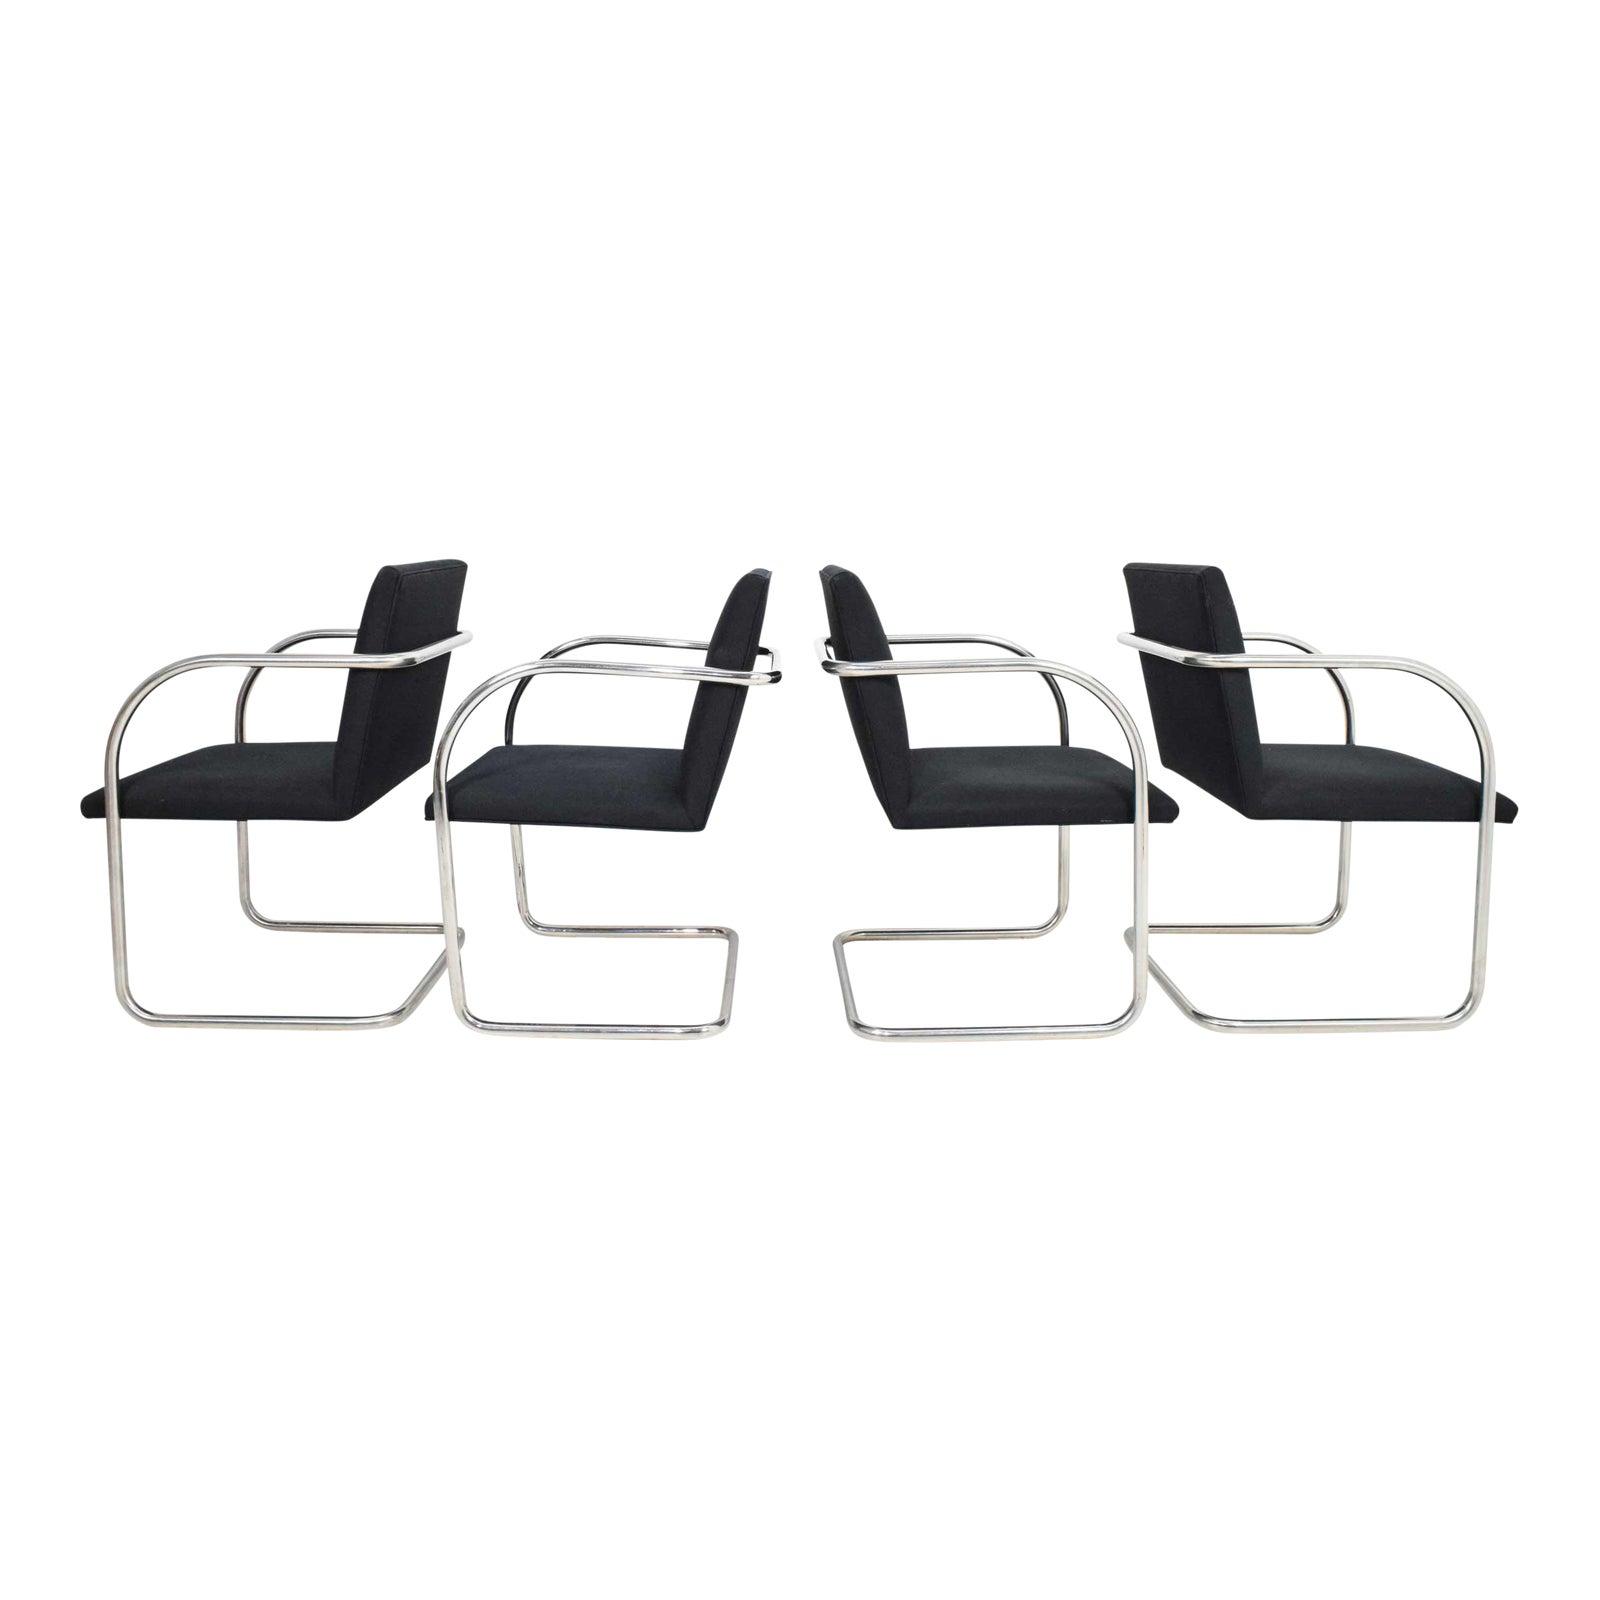 Superior Mies Van Der Rohe Tubular Brno Chairs By Knoll